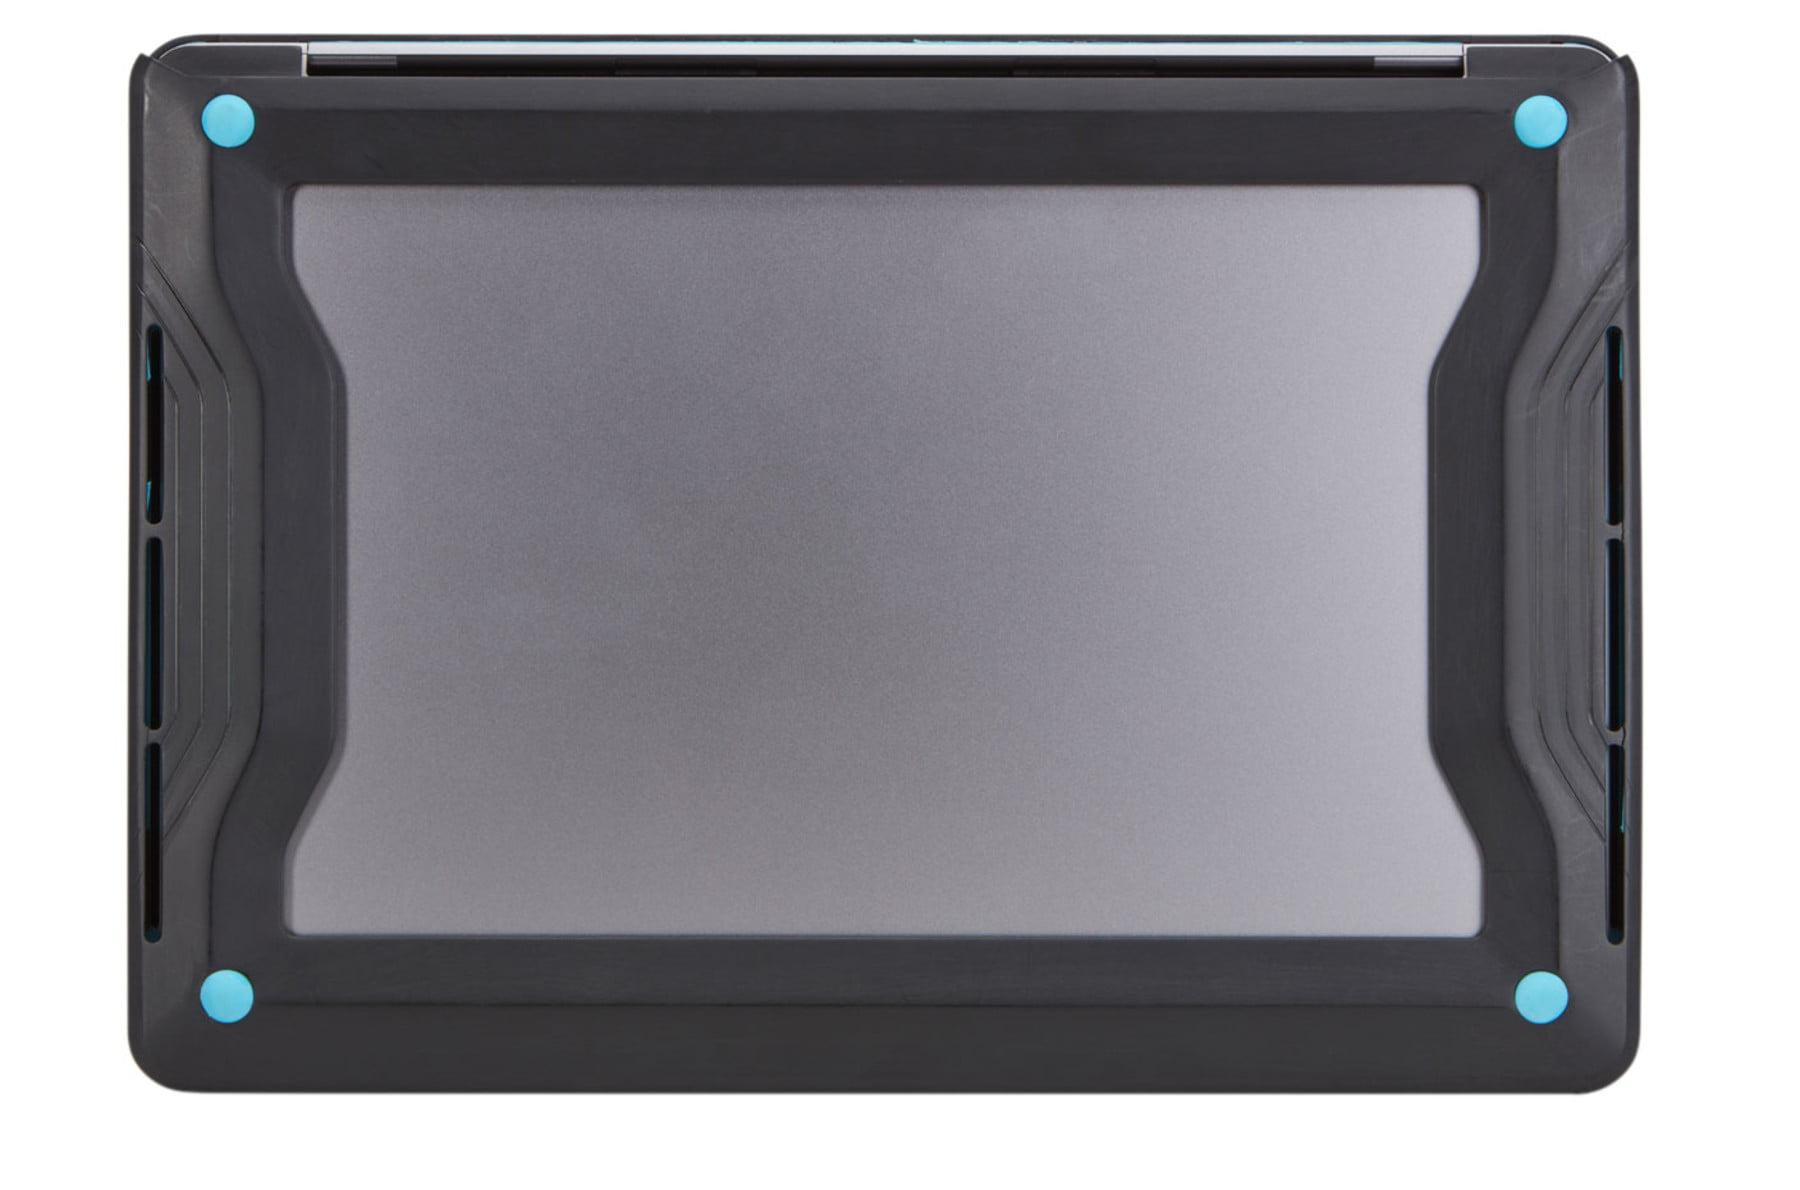 Carcasa laptop Thule Vectros Protective Bumper 13 MacBook Pro Retina 6